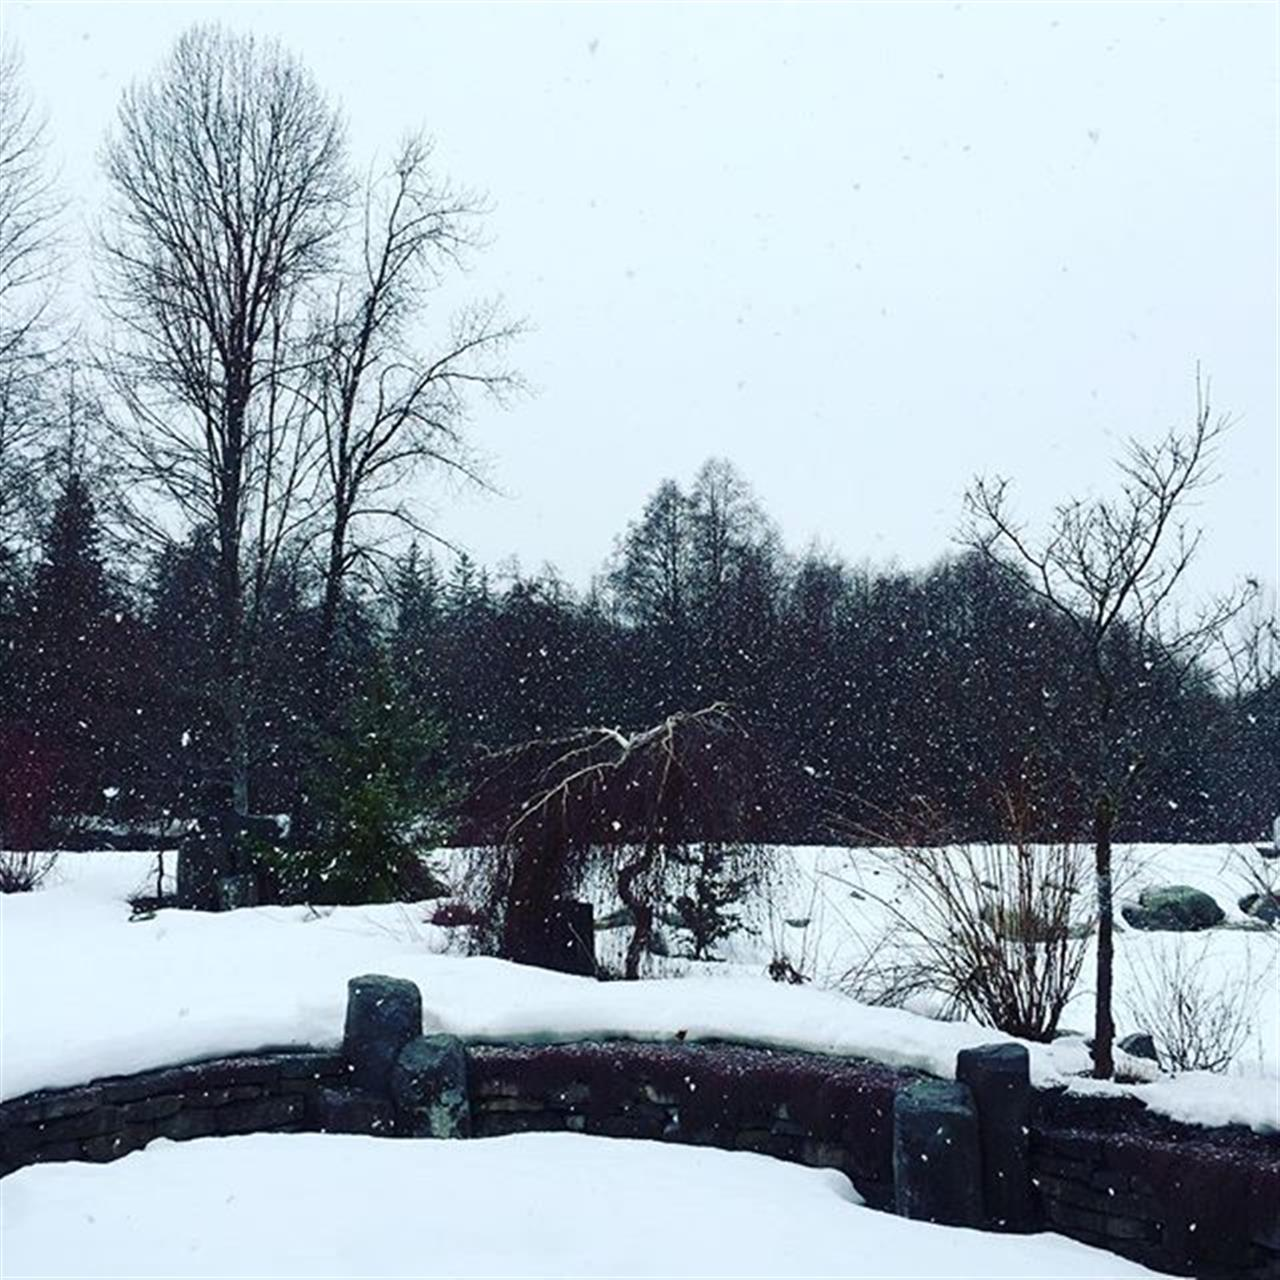 #snowday #whistler #leadingrelocal #realestateagent